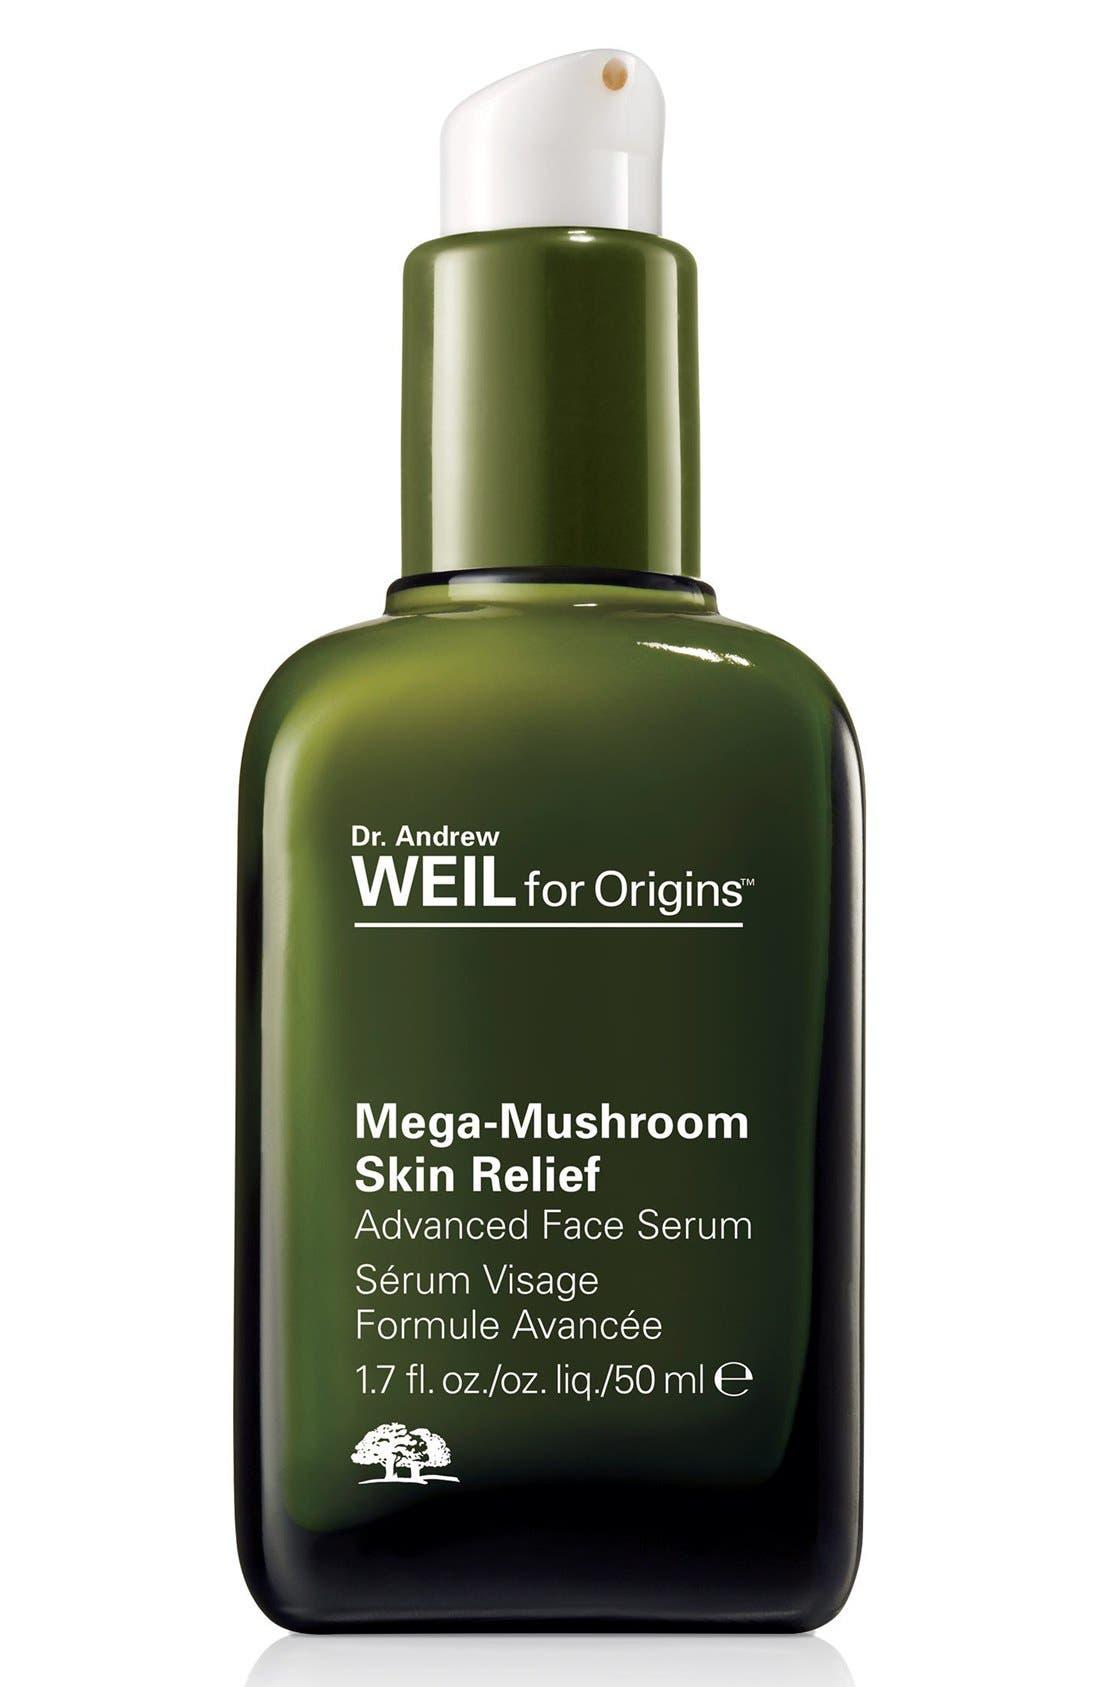 Origins Dr. Andrew Weil for Origins™ Mega-Mushroom Skin Relief Advanced Face Serum